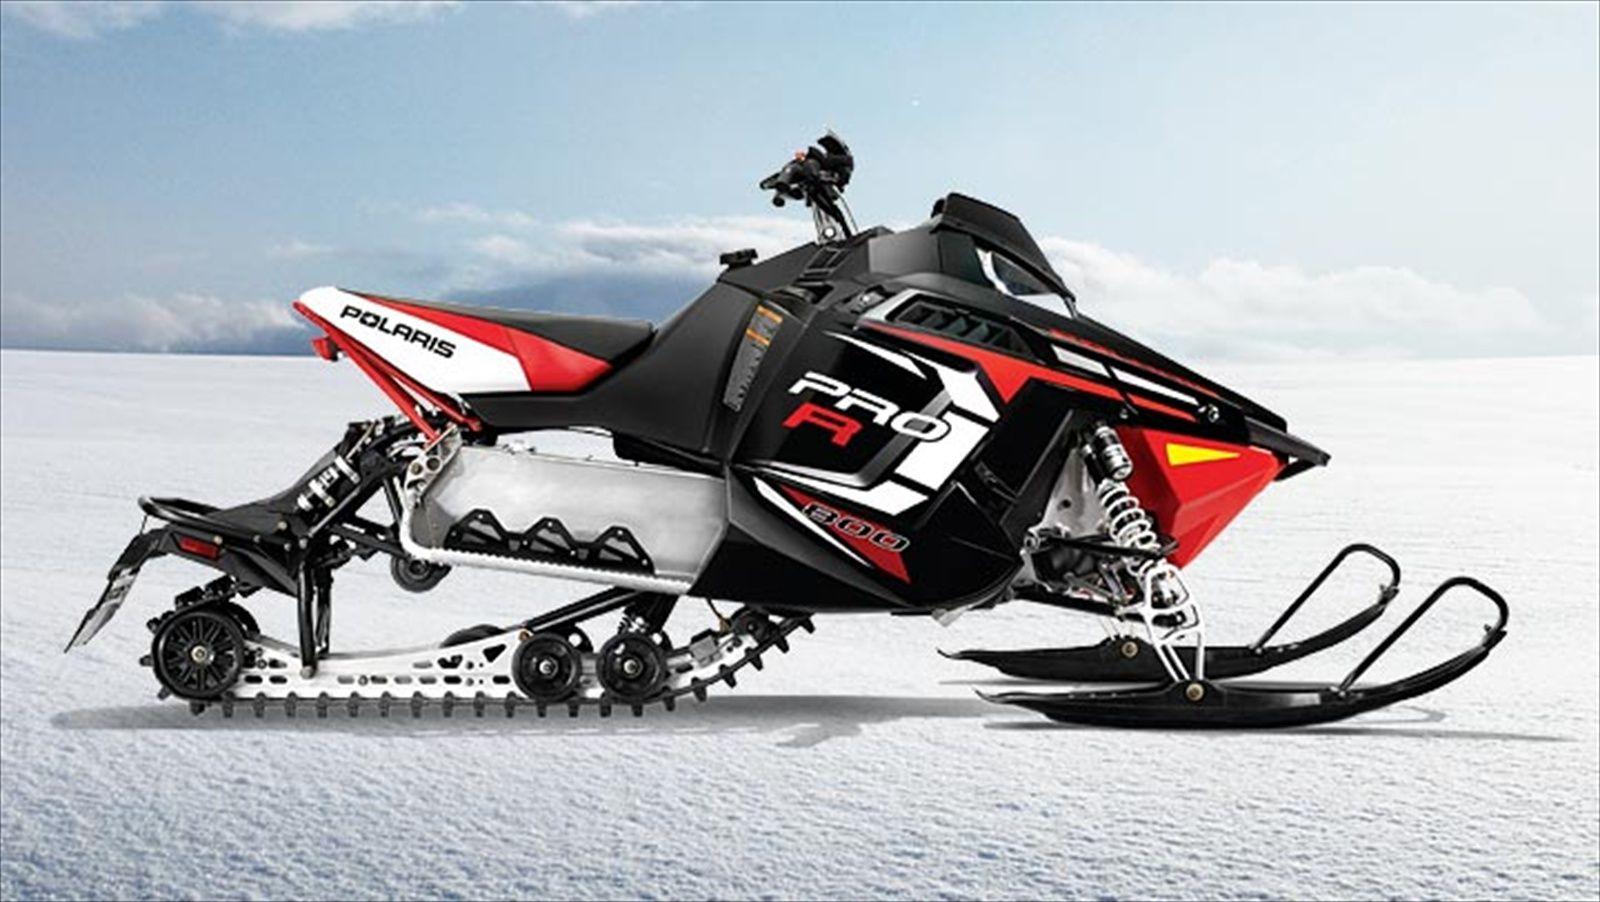 Polaris 800 rush pro r 2012